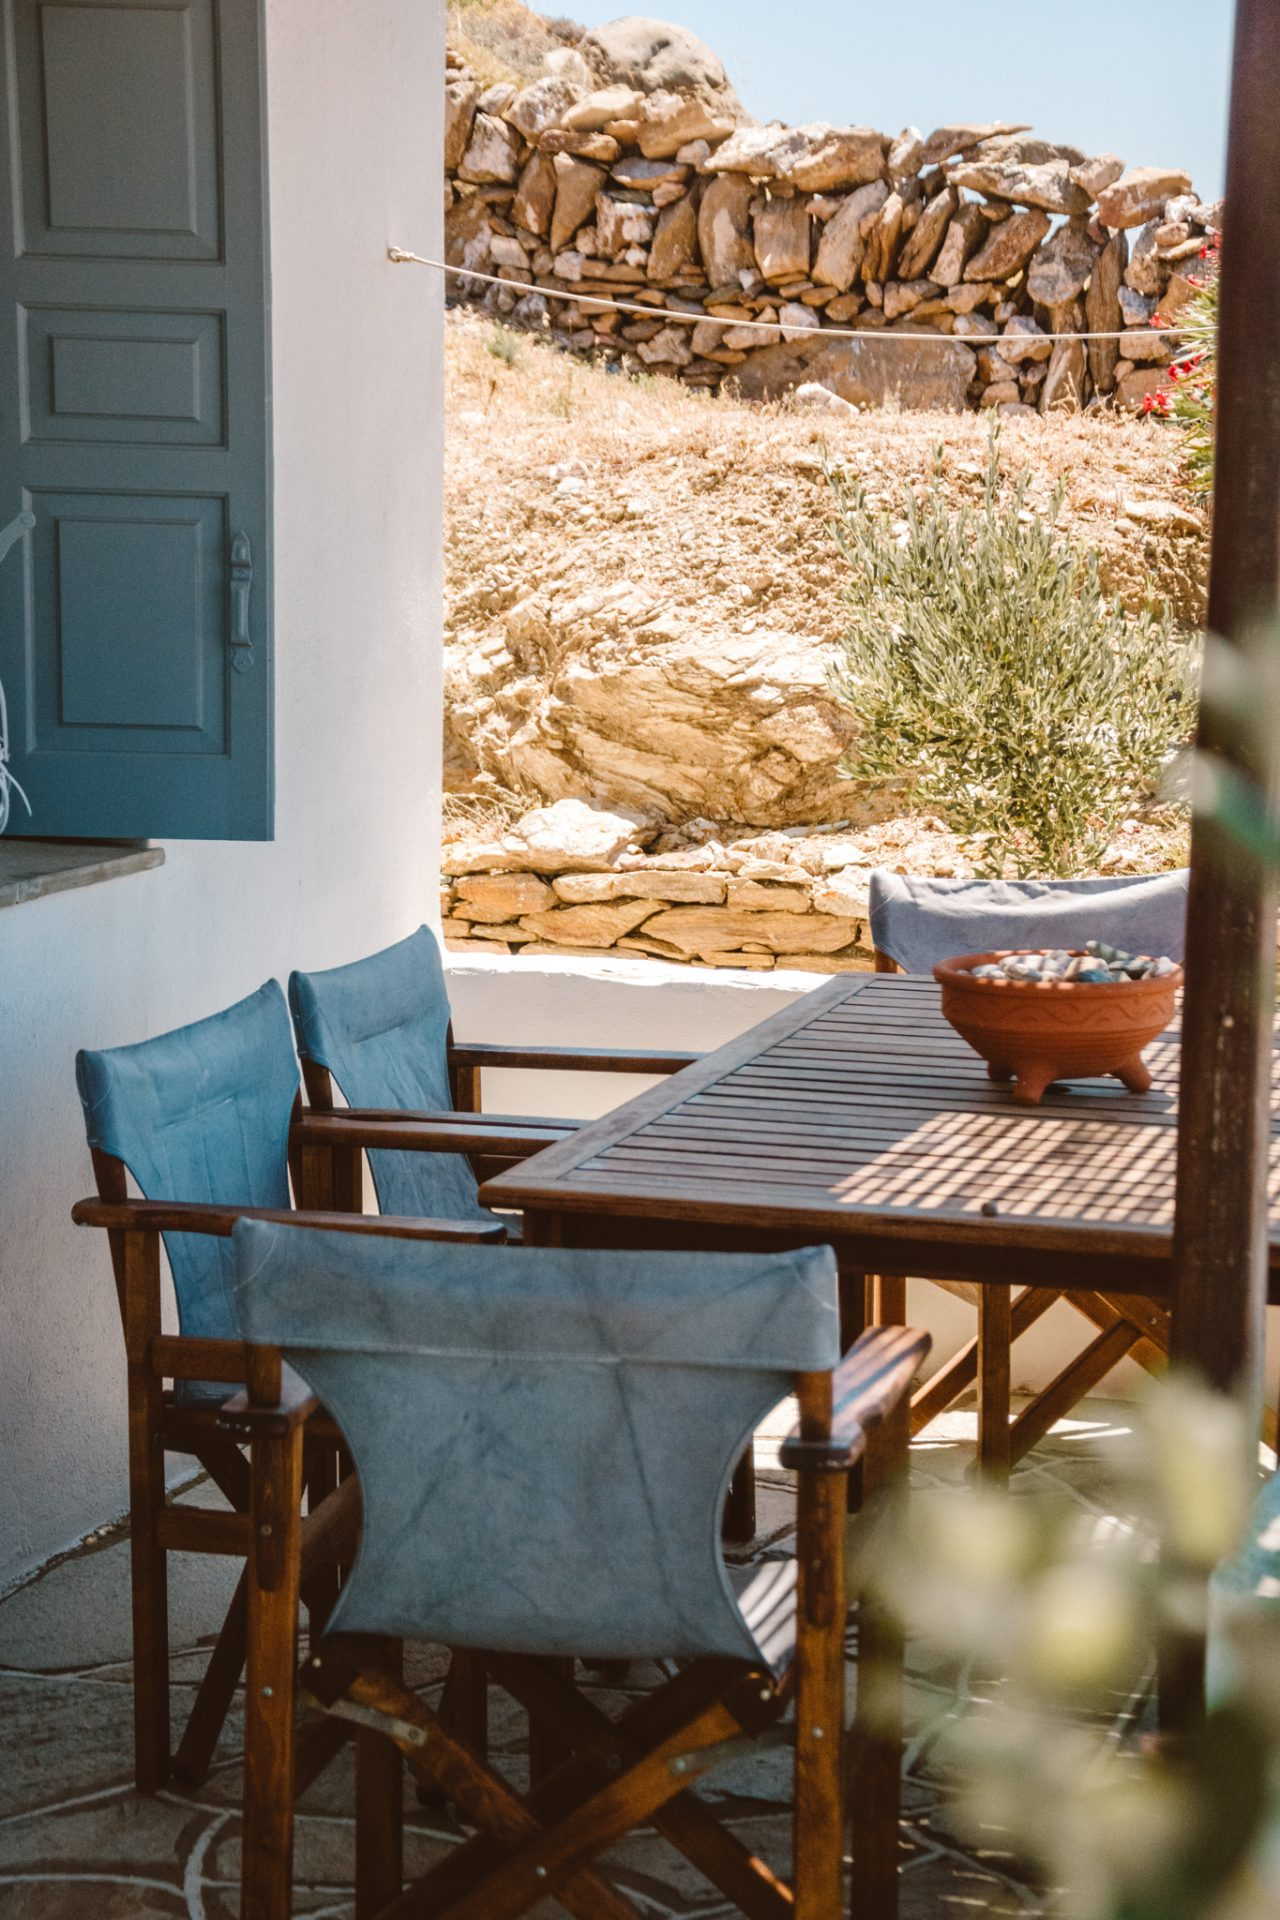 Kavos Hotel in Sifnos